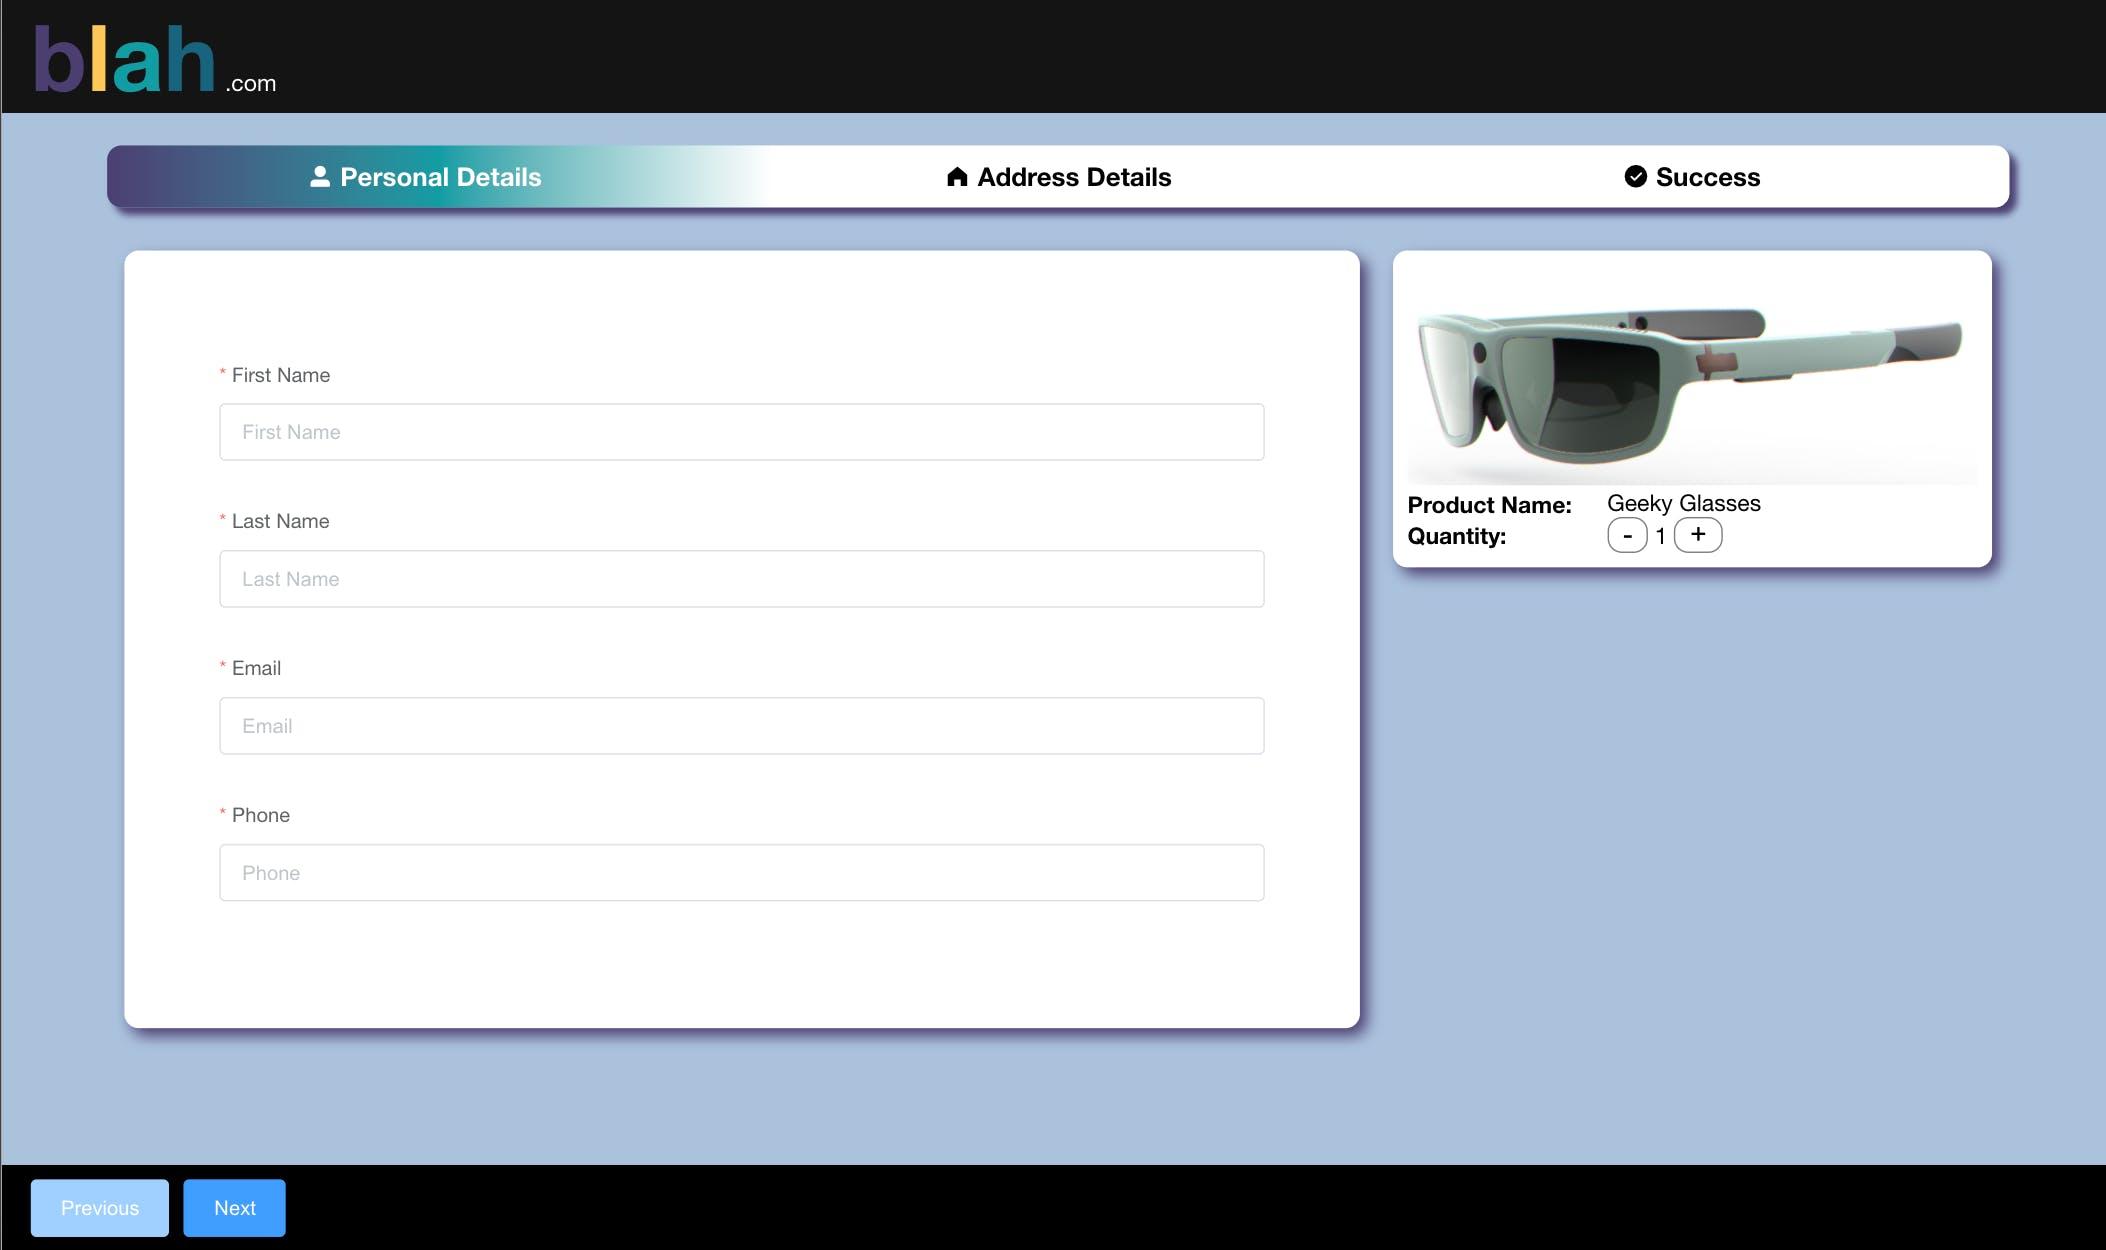 Screenshot 2021-01-04 at 7.37.52 PM.png